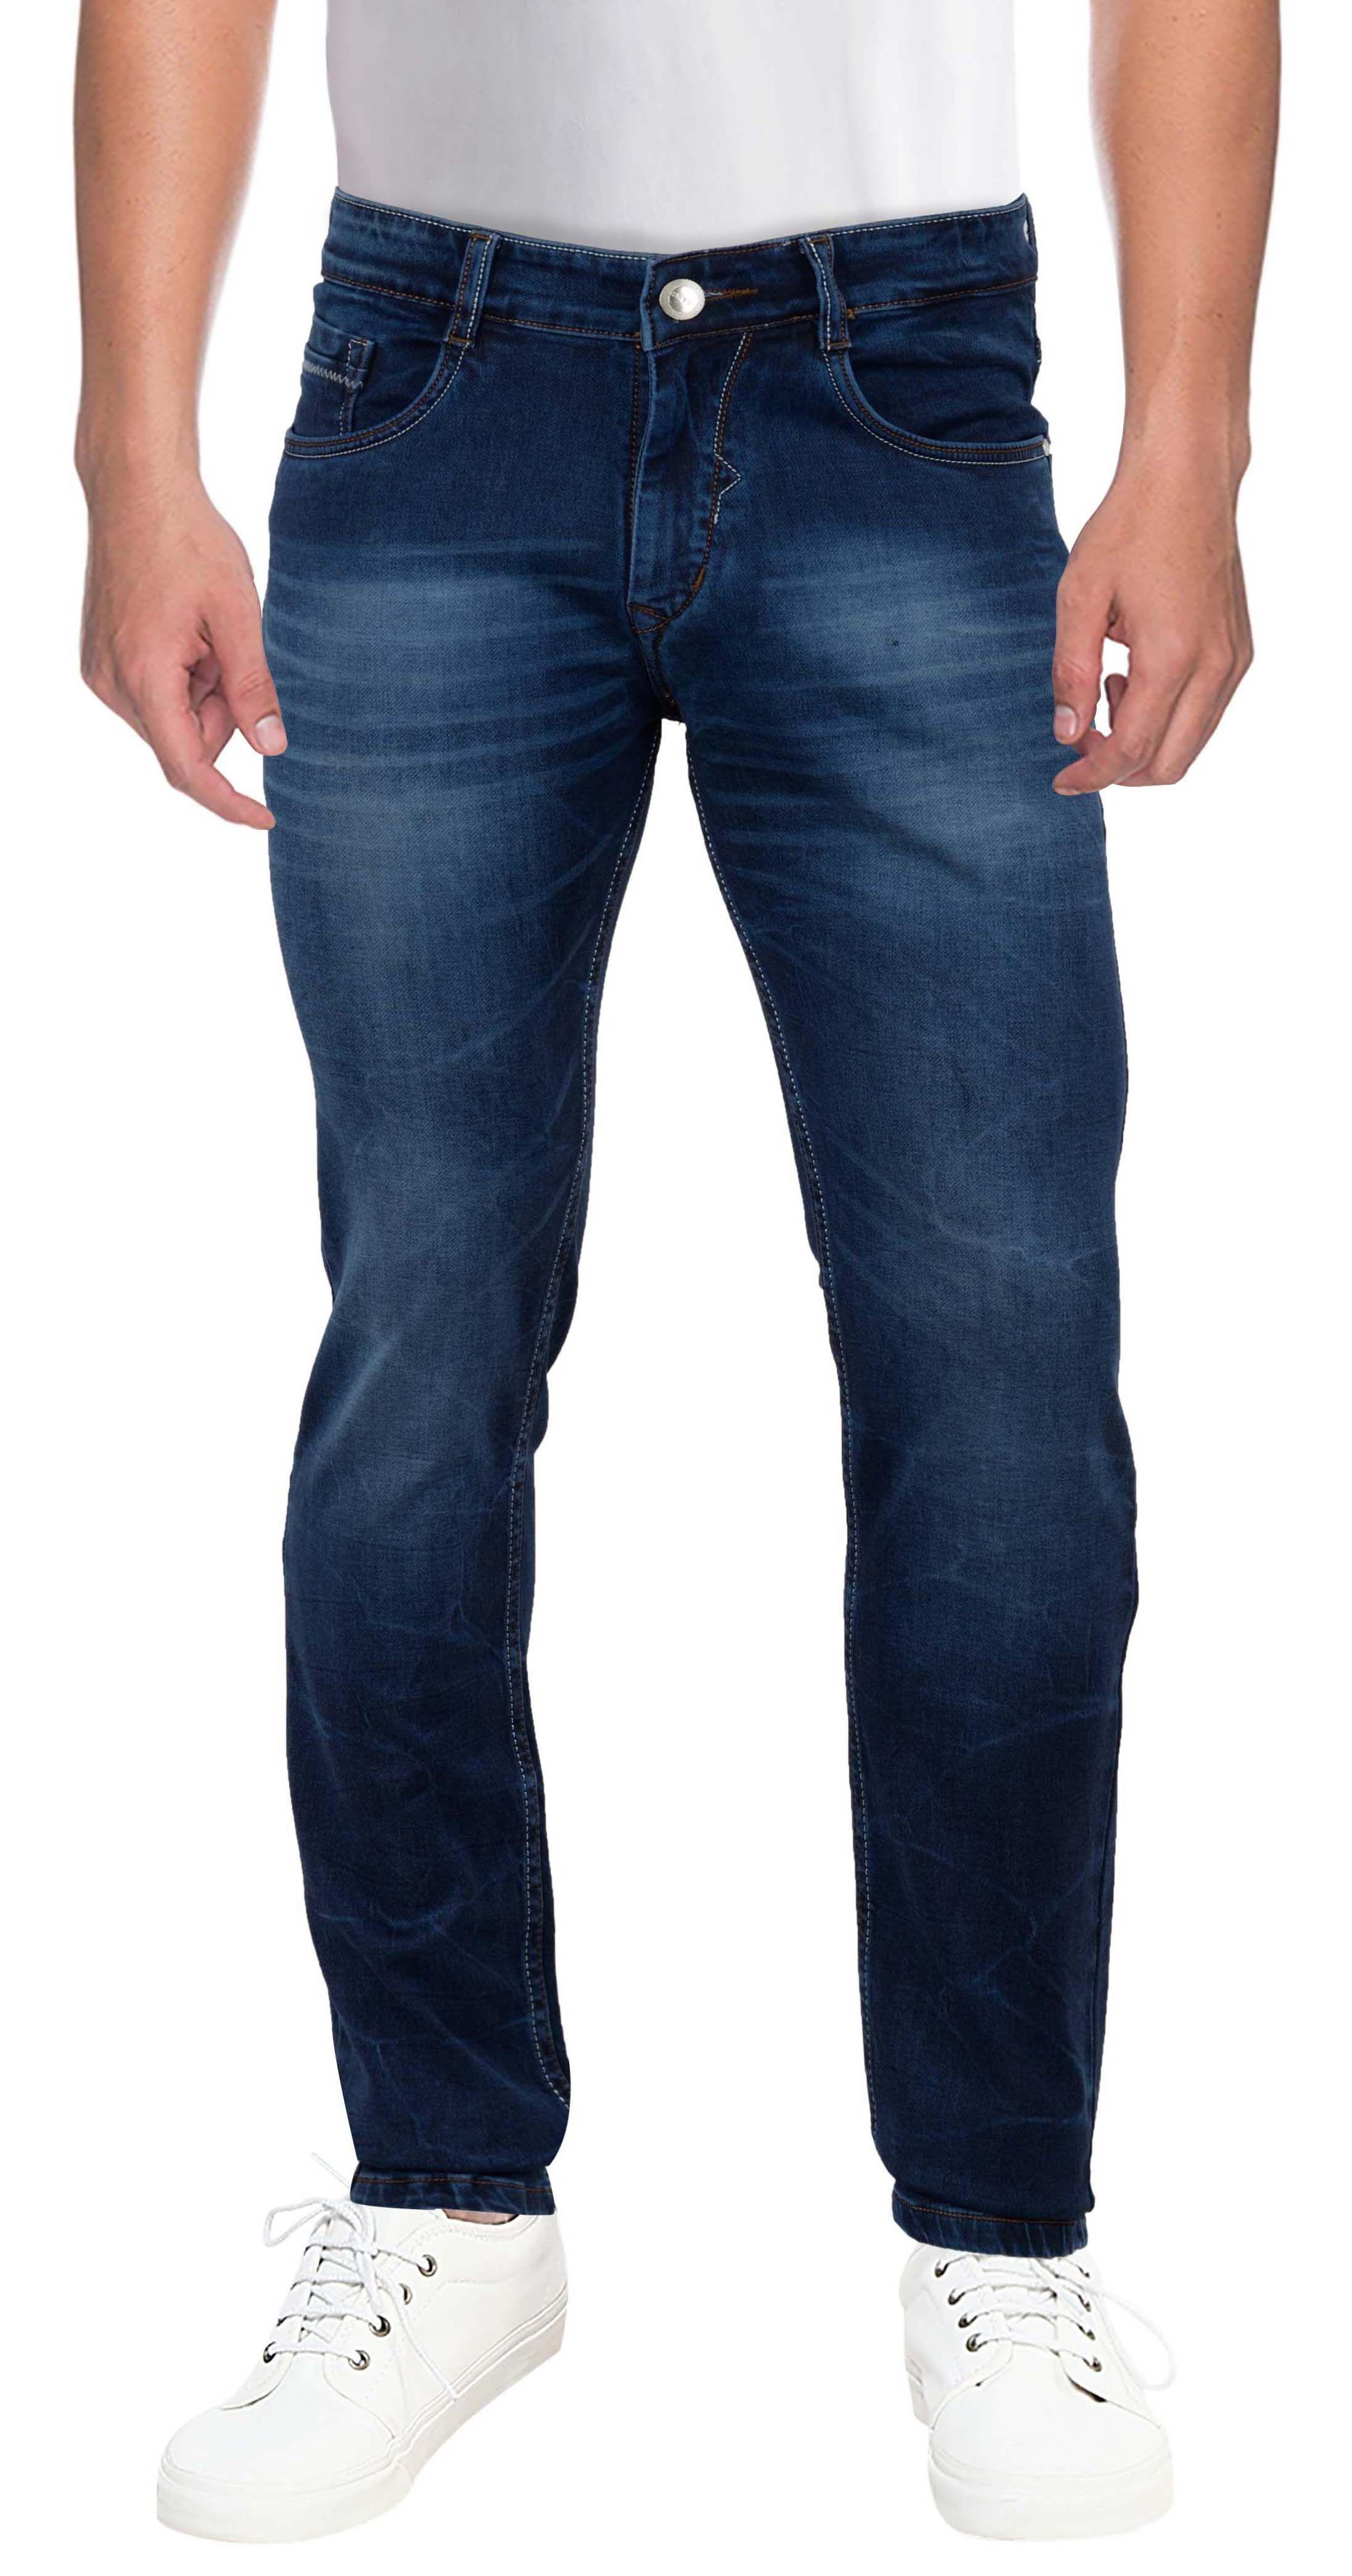 Royal Jeans Blue Slim Jeans